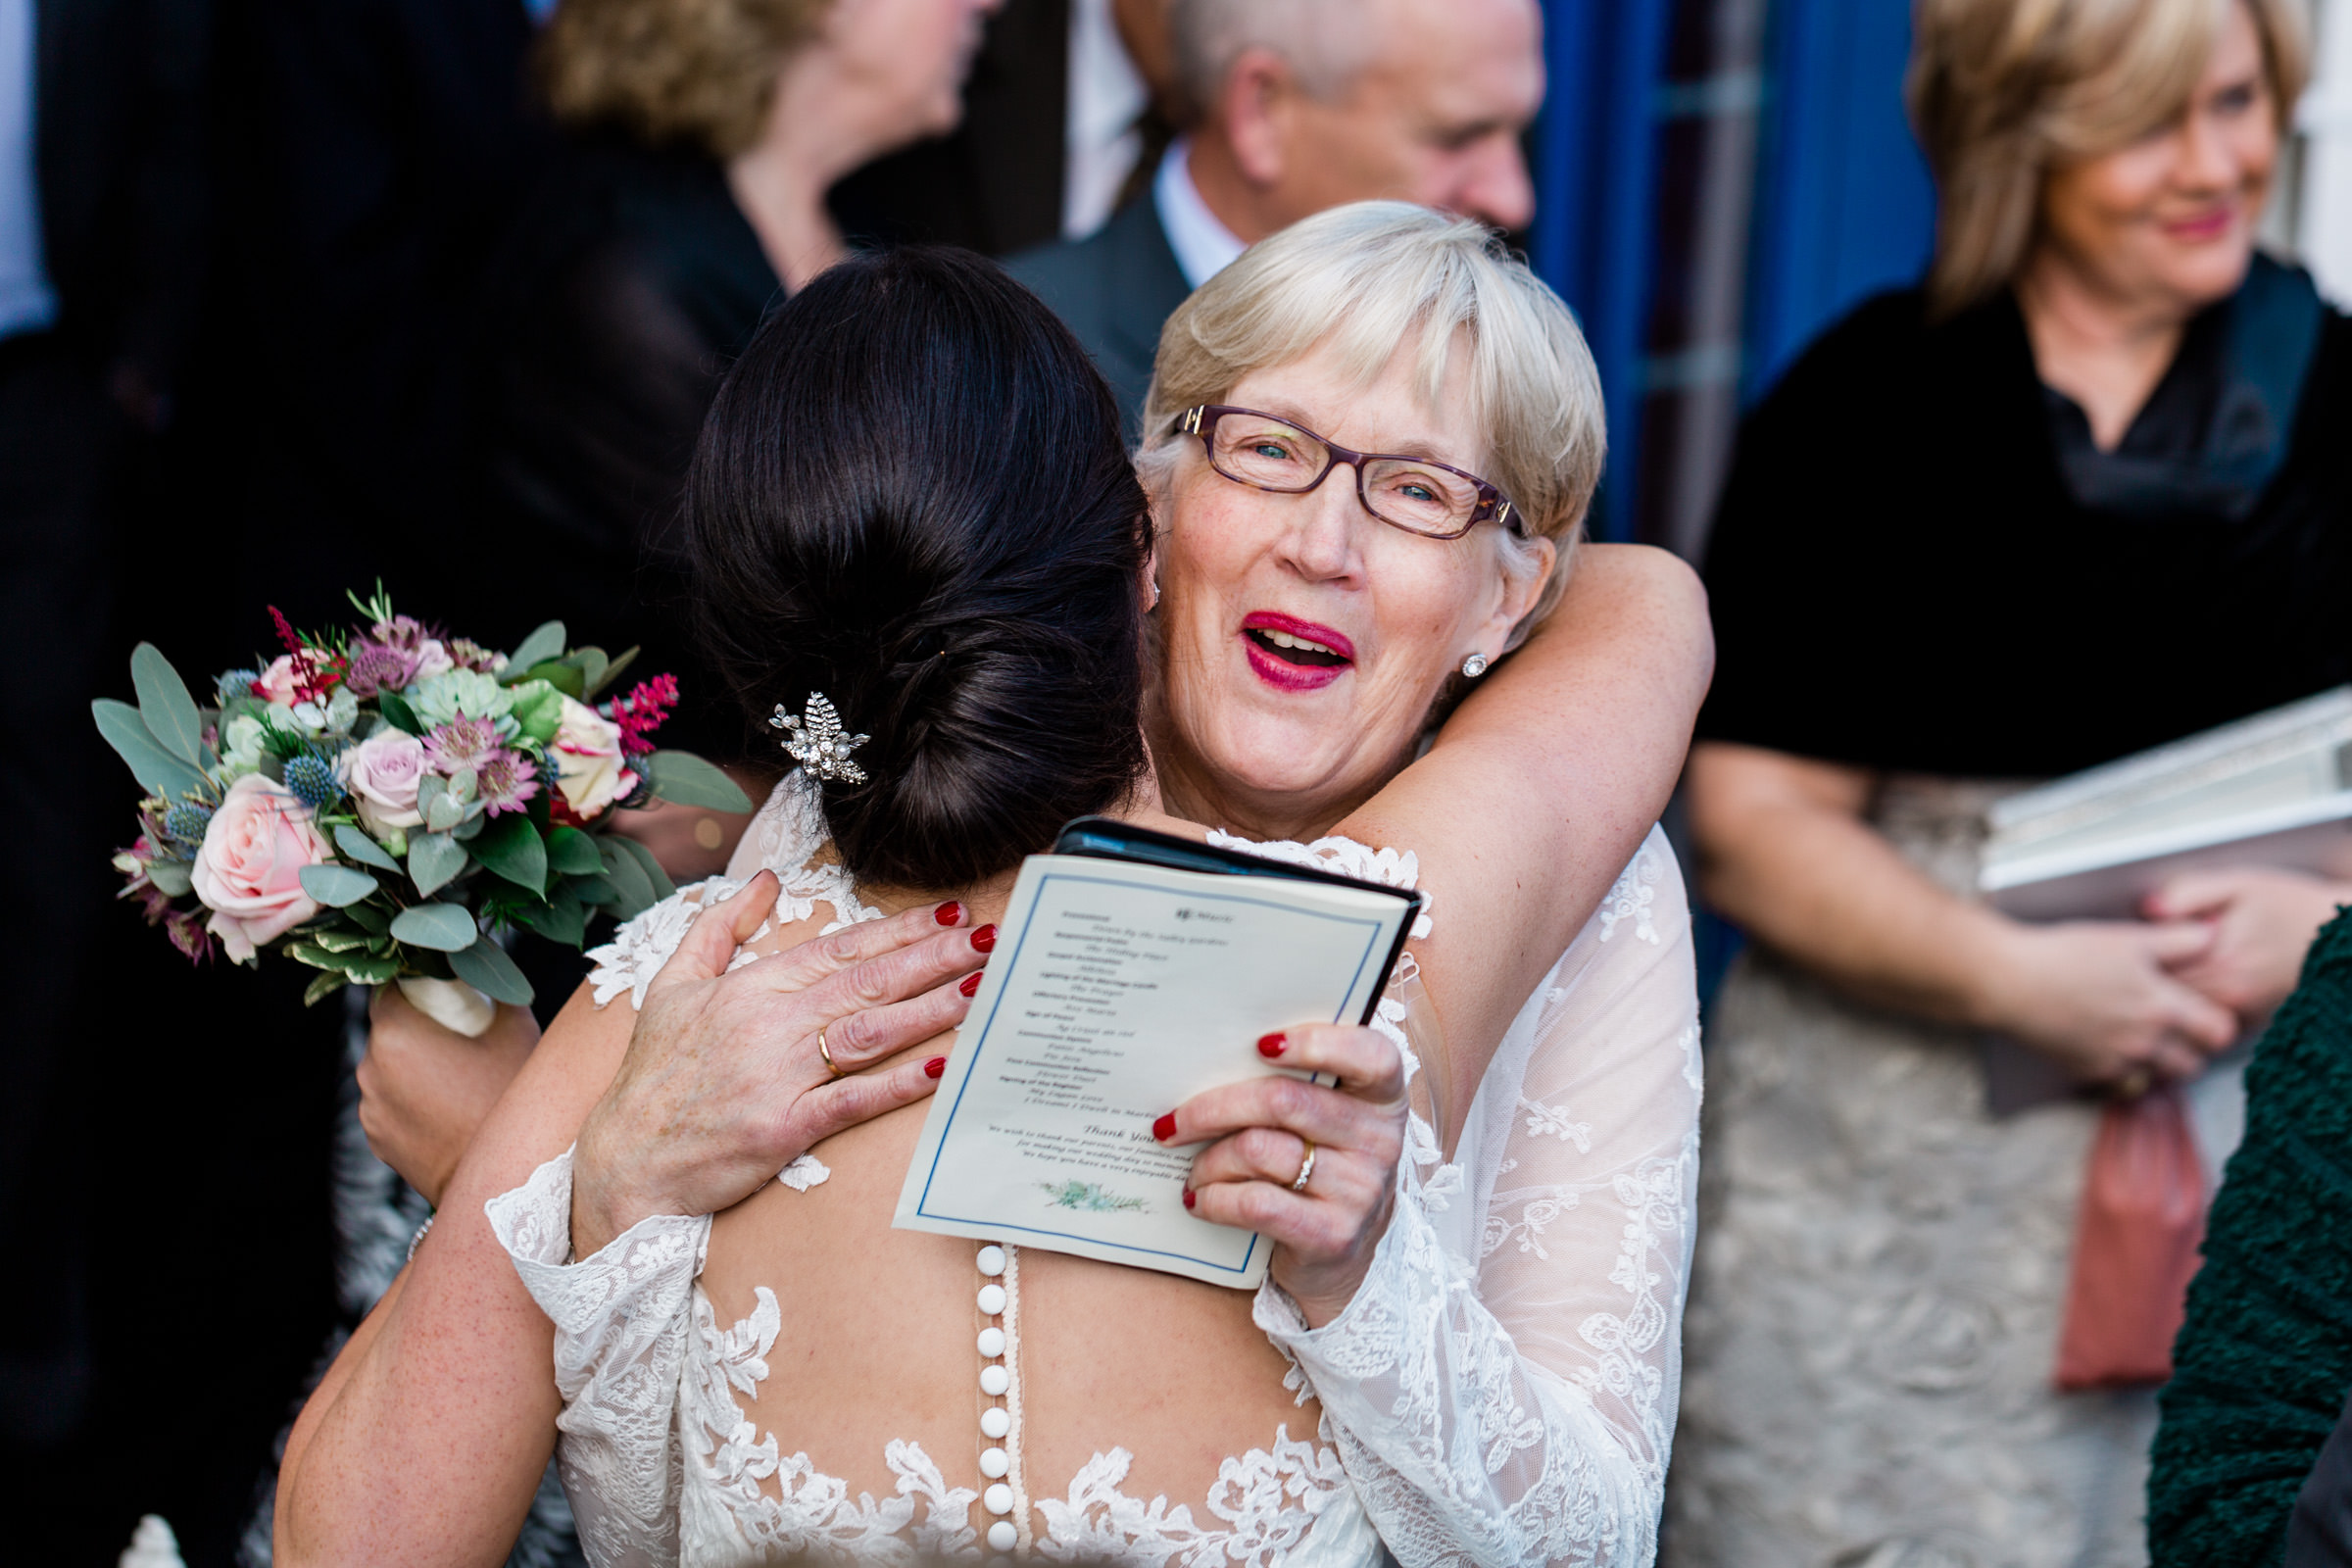 bride-mother-embrace-the-portrait-room